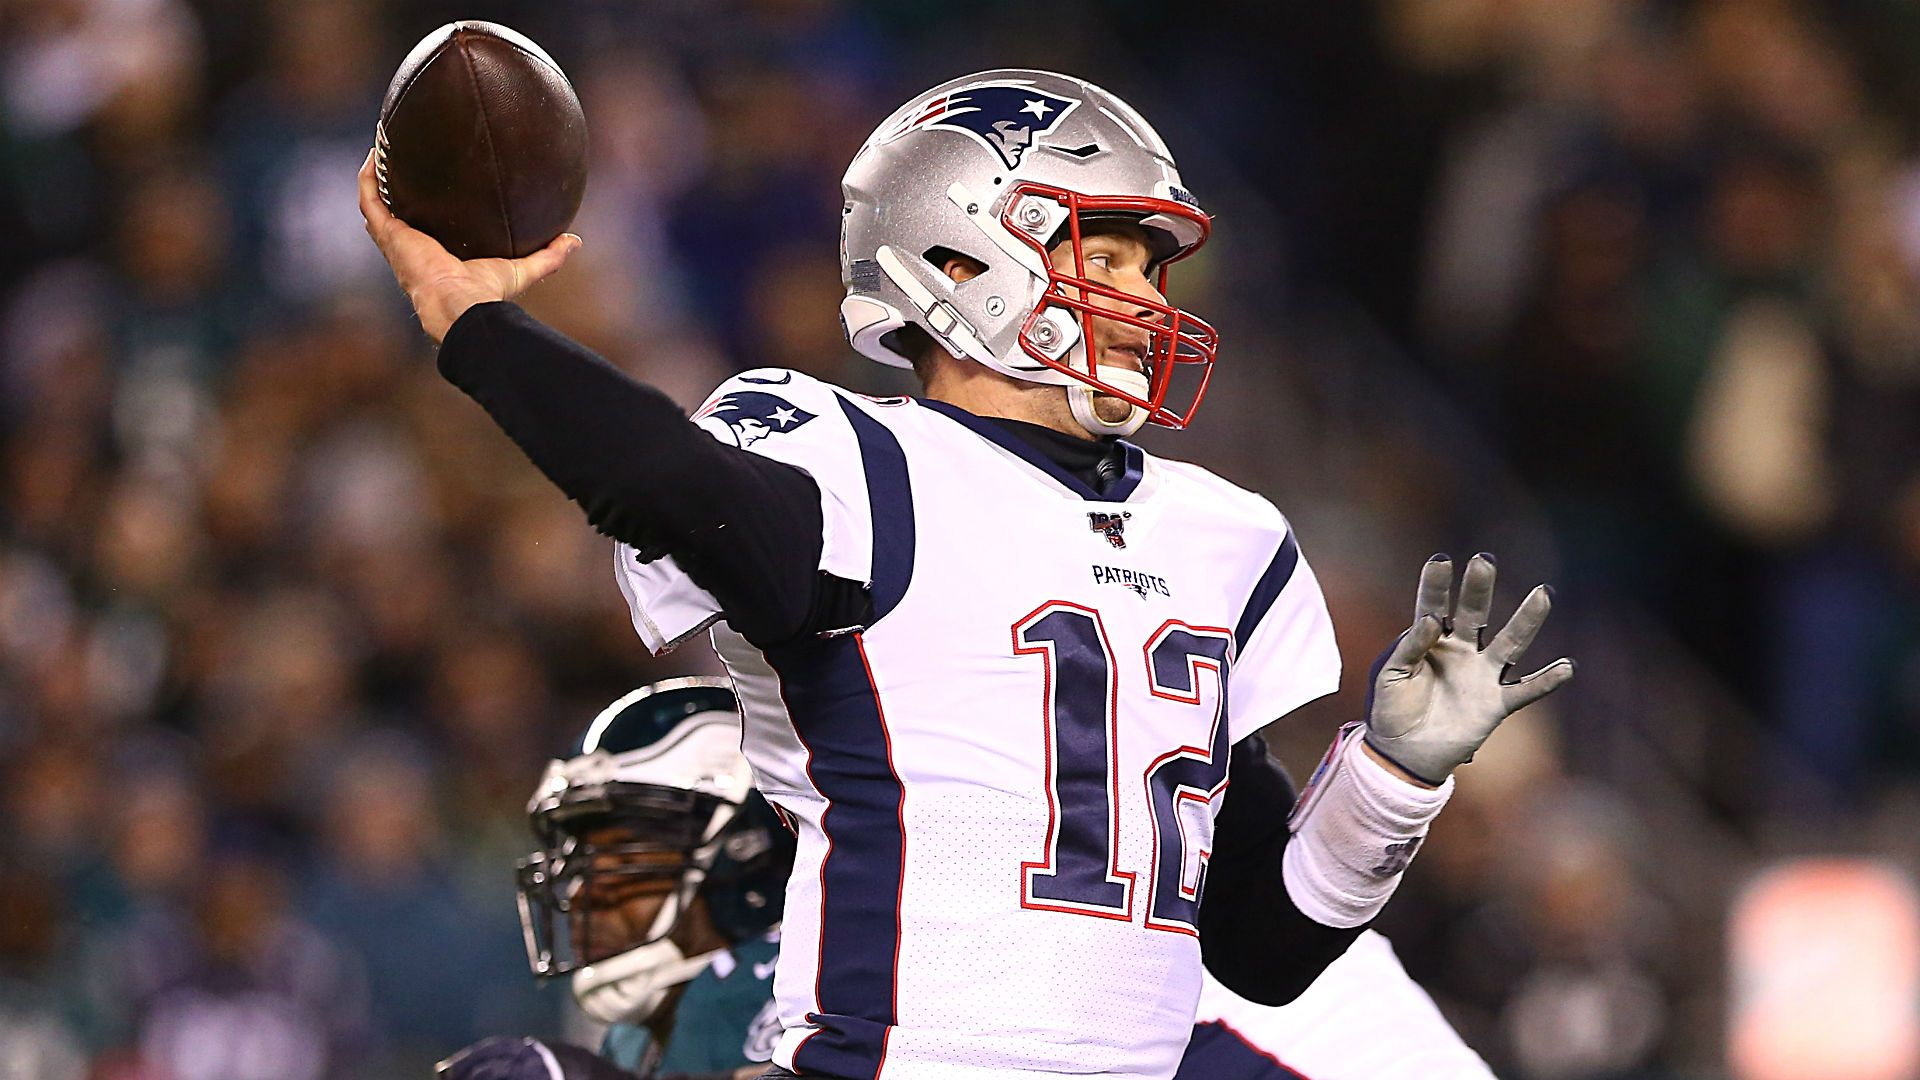 Tom Brady Injury Update Patriots Qb Elbow Questionable For Game Vs Cowboys National Football League News New England S Patriots Qb Patriots Fans Patriots